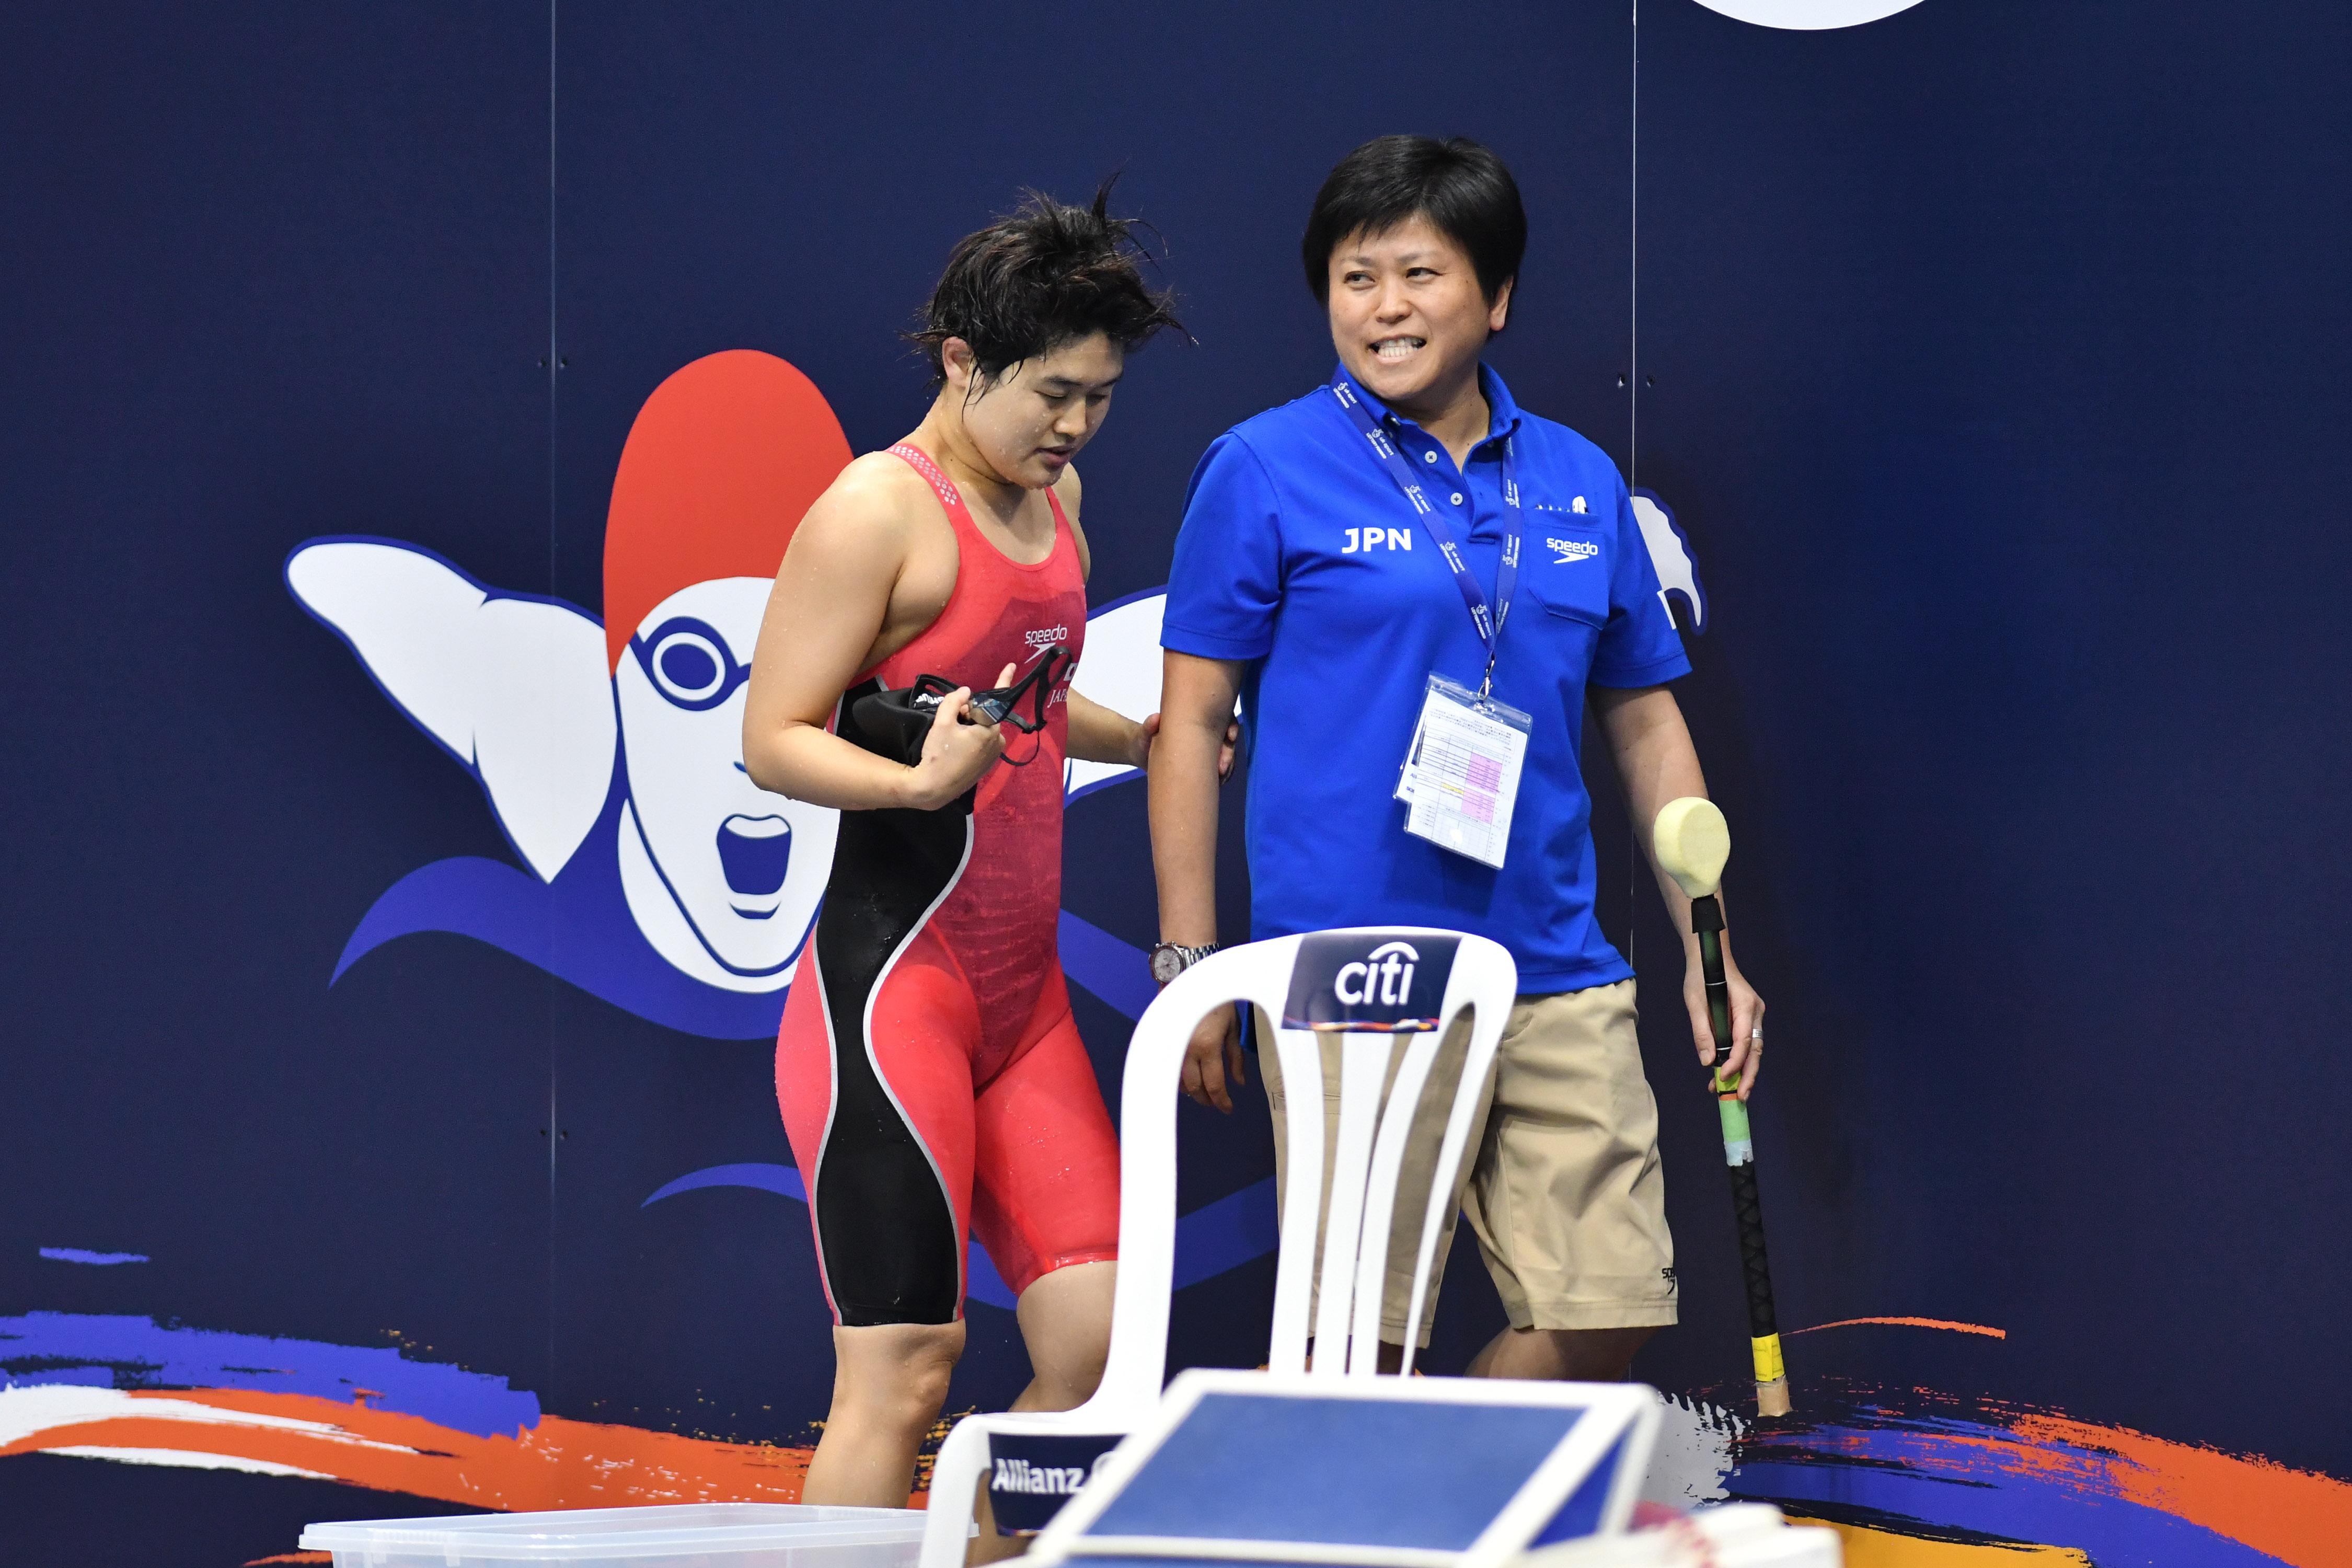 ISHIMURA Tomomi (JPN) Women's 50m Freestyle S11 Final